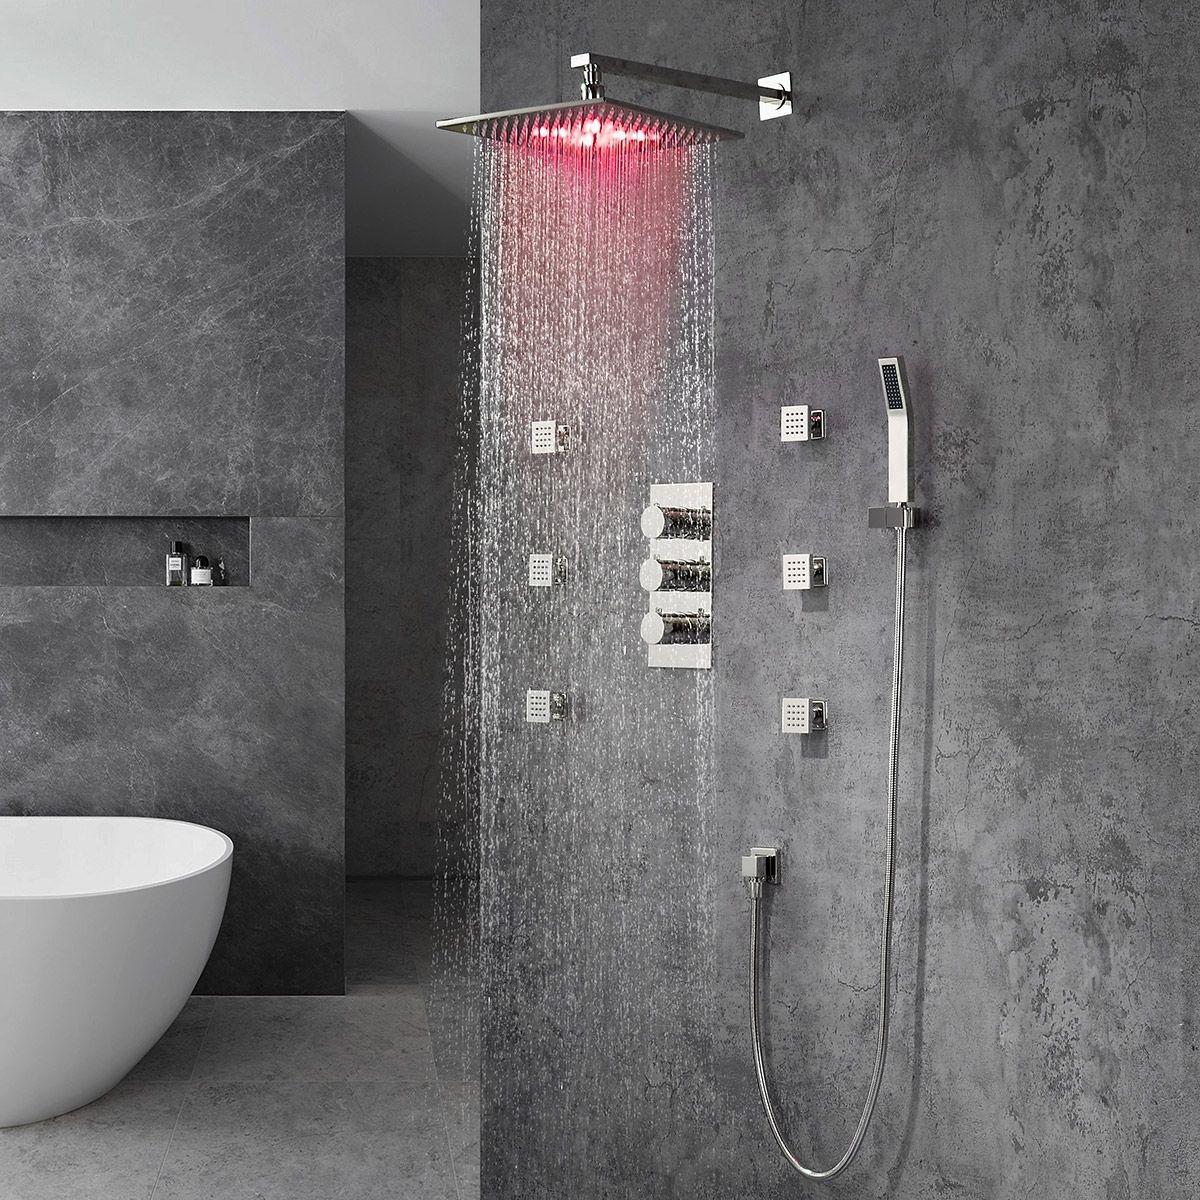 Modern Wall Mount 20 X40 Rain Head With Hanshower Body Spray Jets Shower Set In Polished Chrome Solid Brass In 2021 Rain Head Luxury Shower Shower Set [ jpg ]